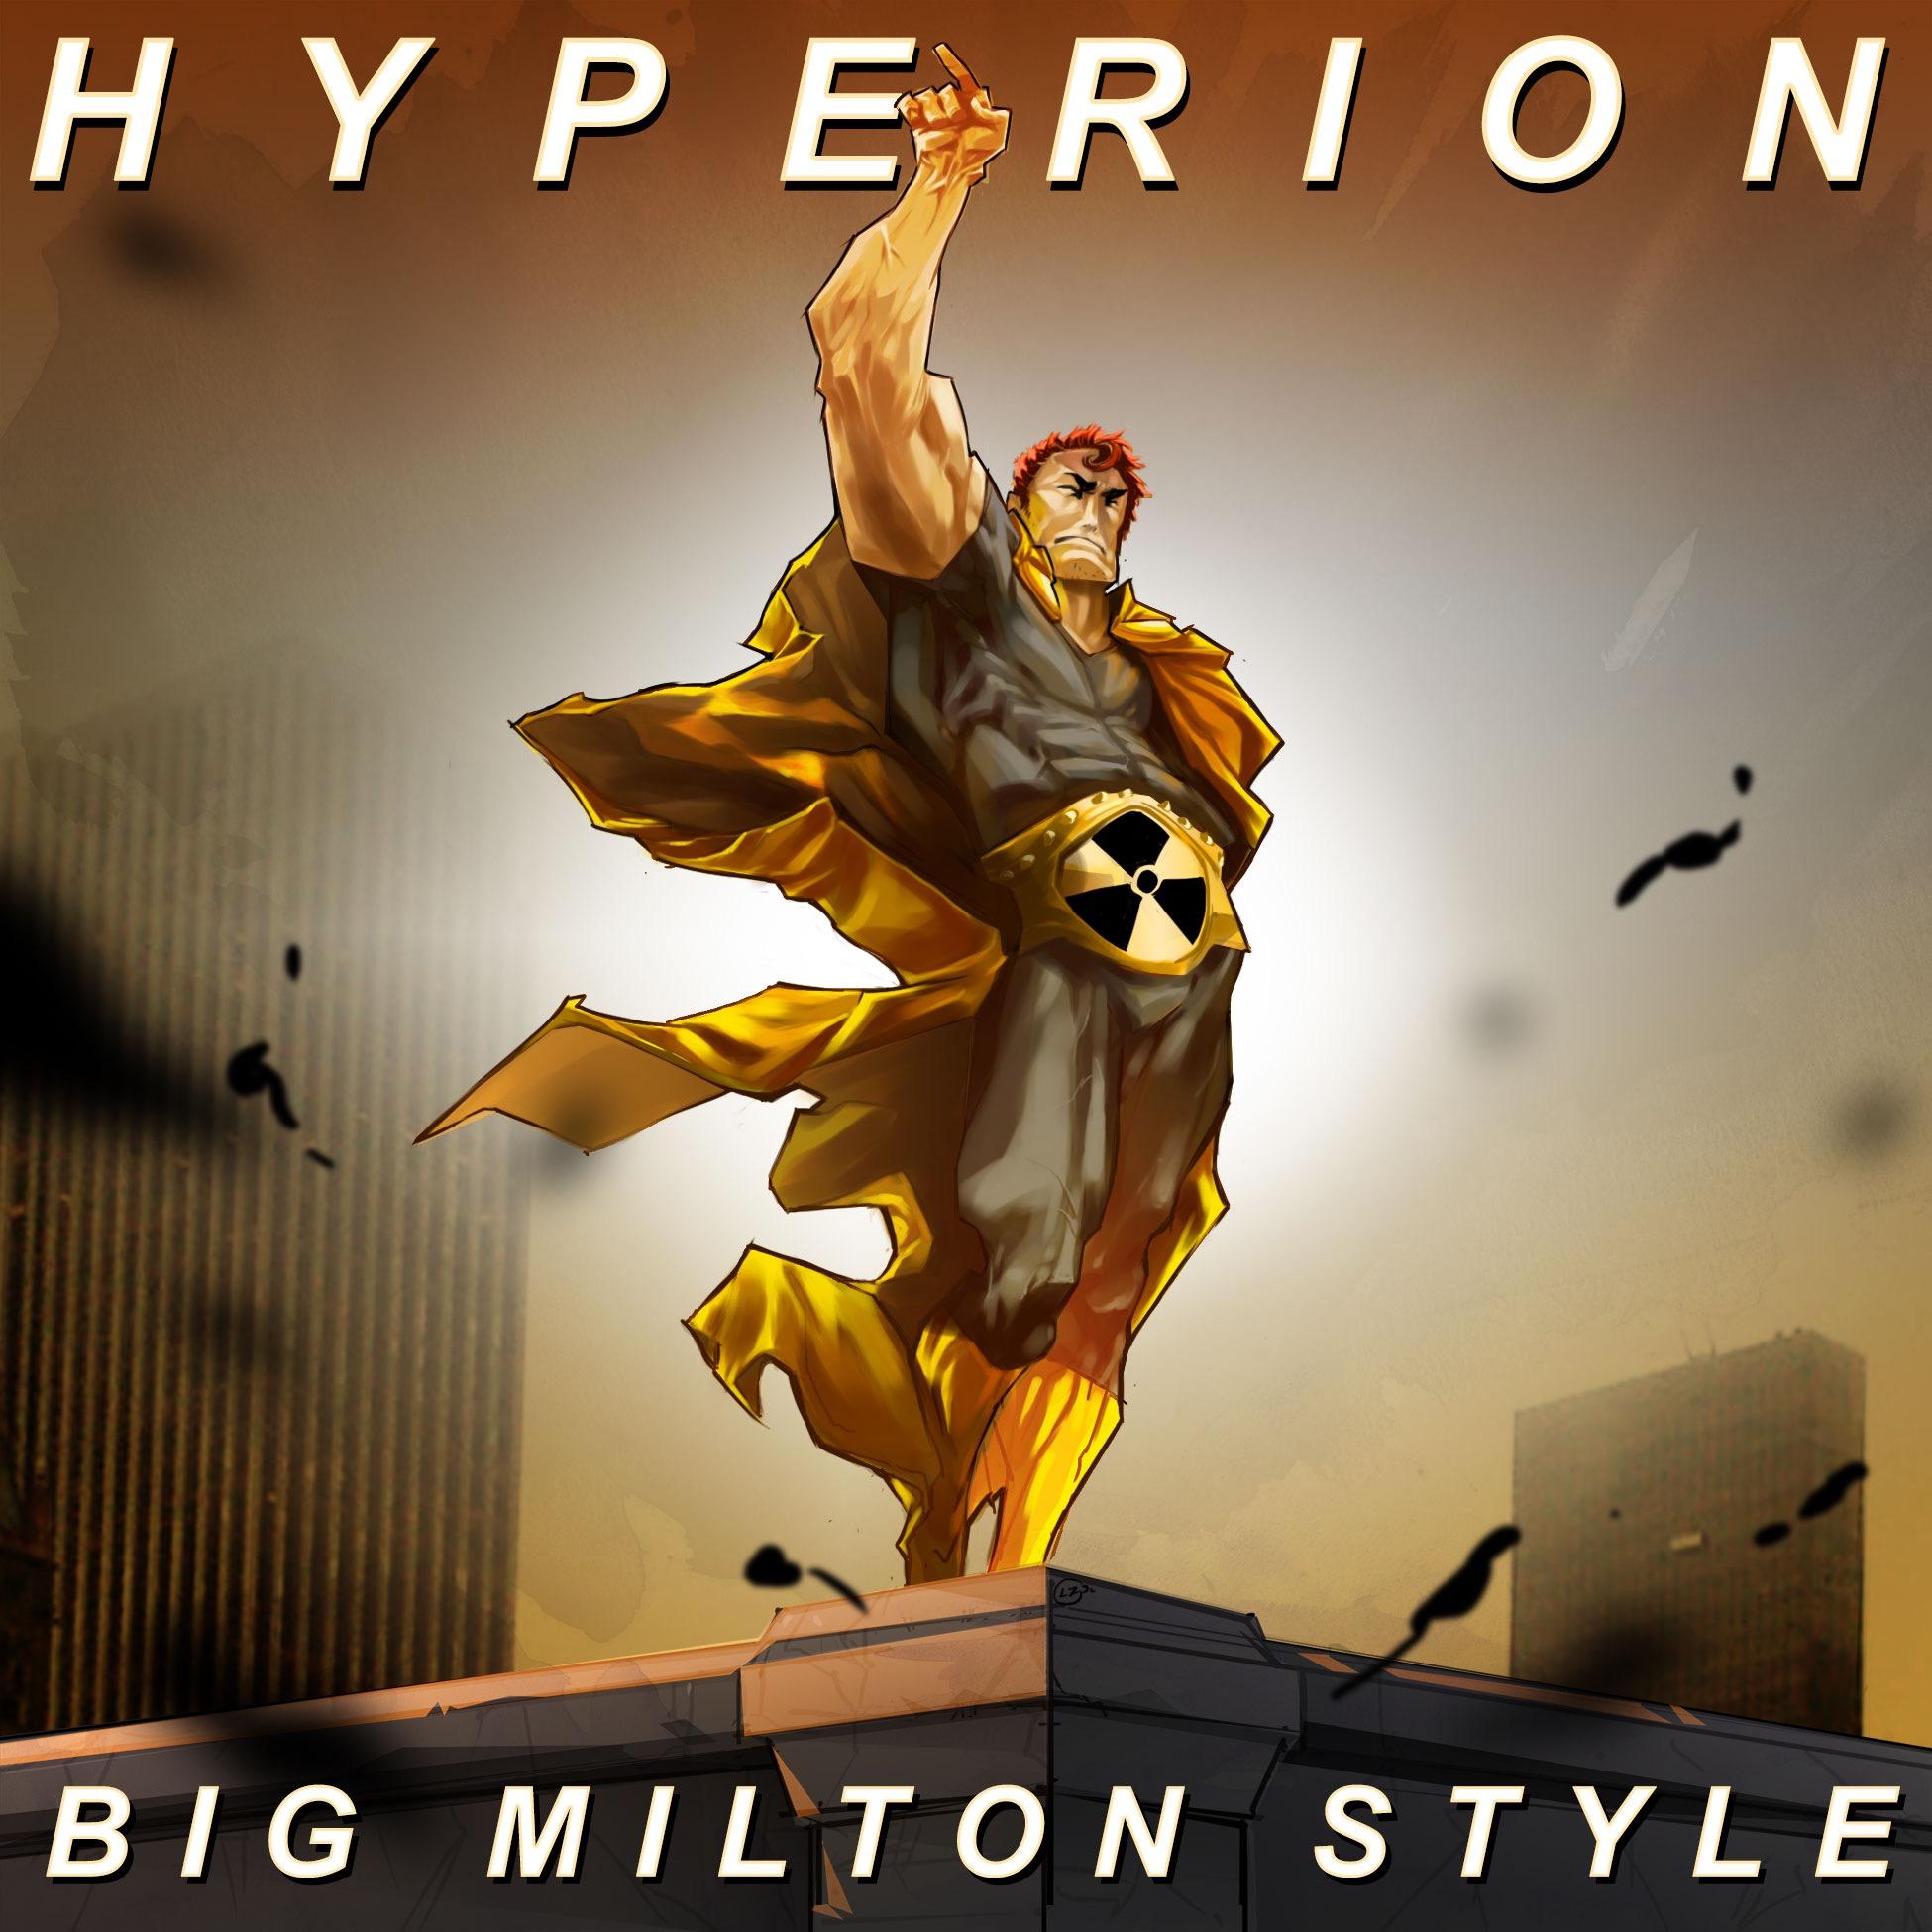 Hyperion_1_Mills_Hip-Hop_Variant.jpg